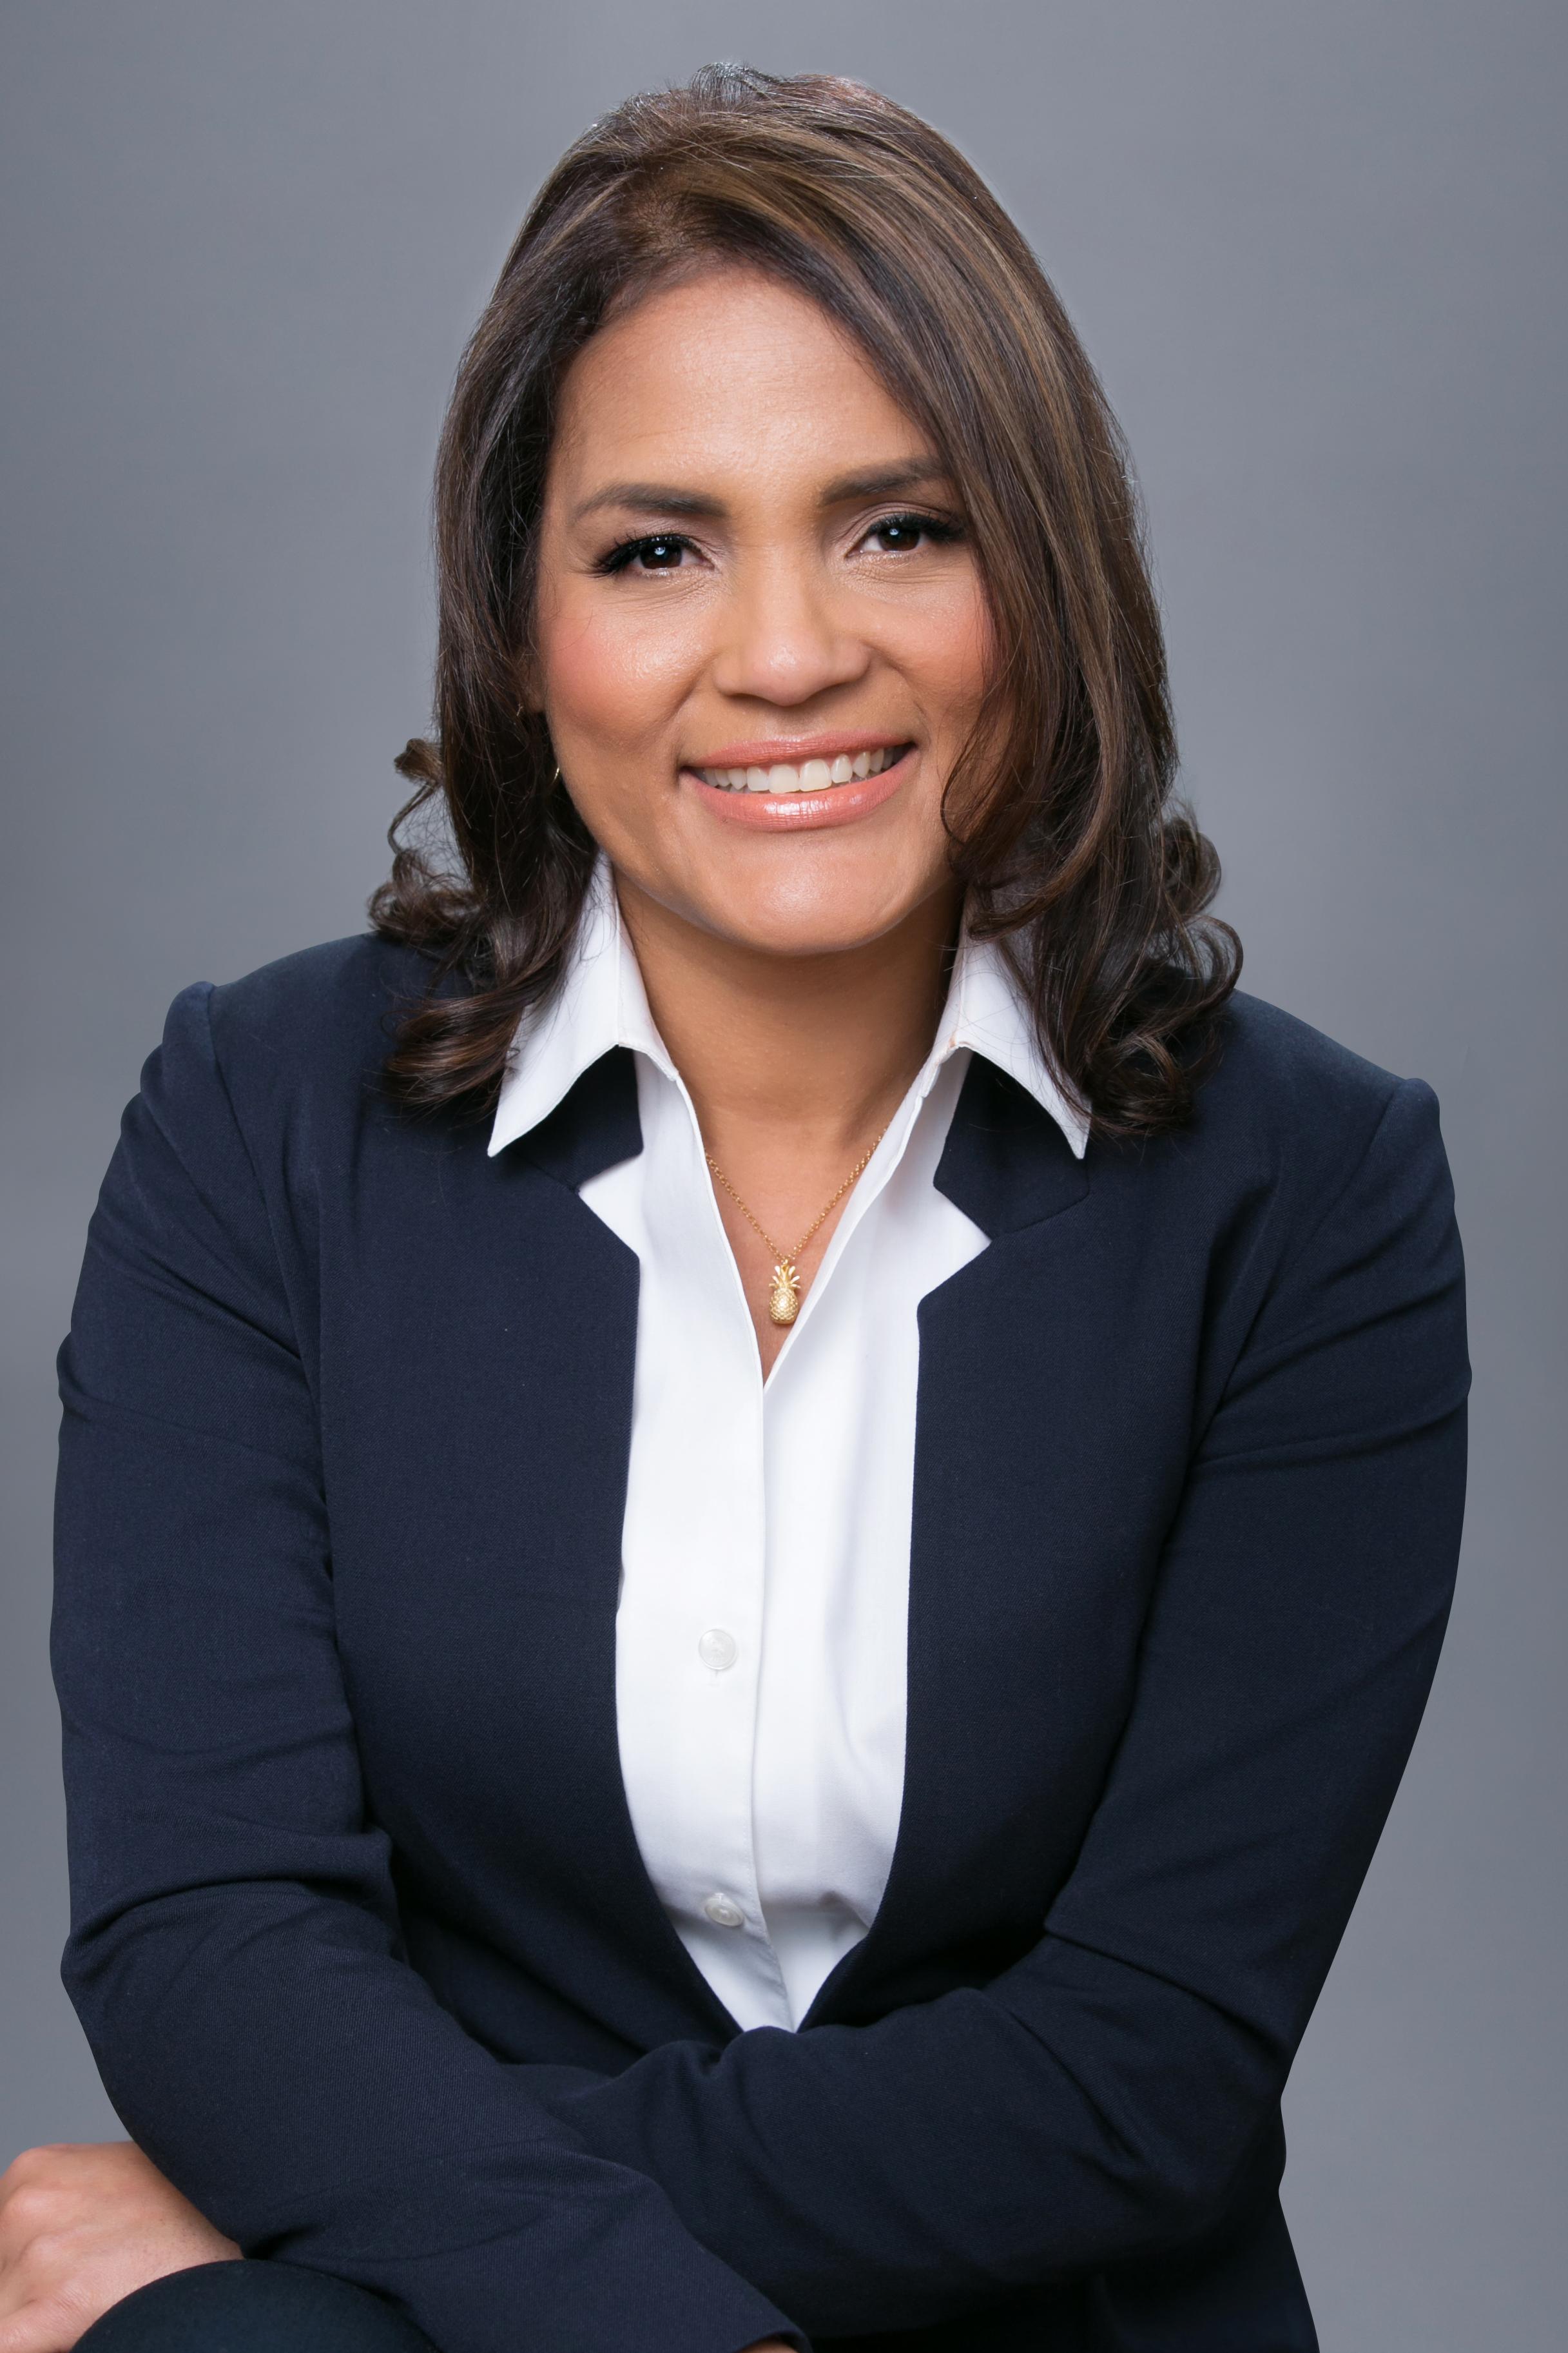 Erika Rendino